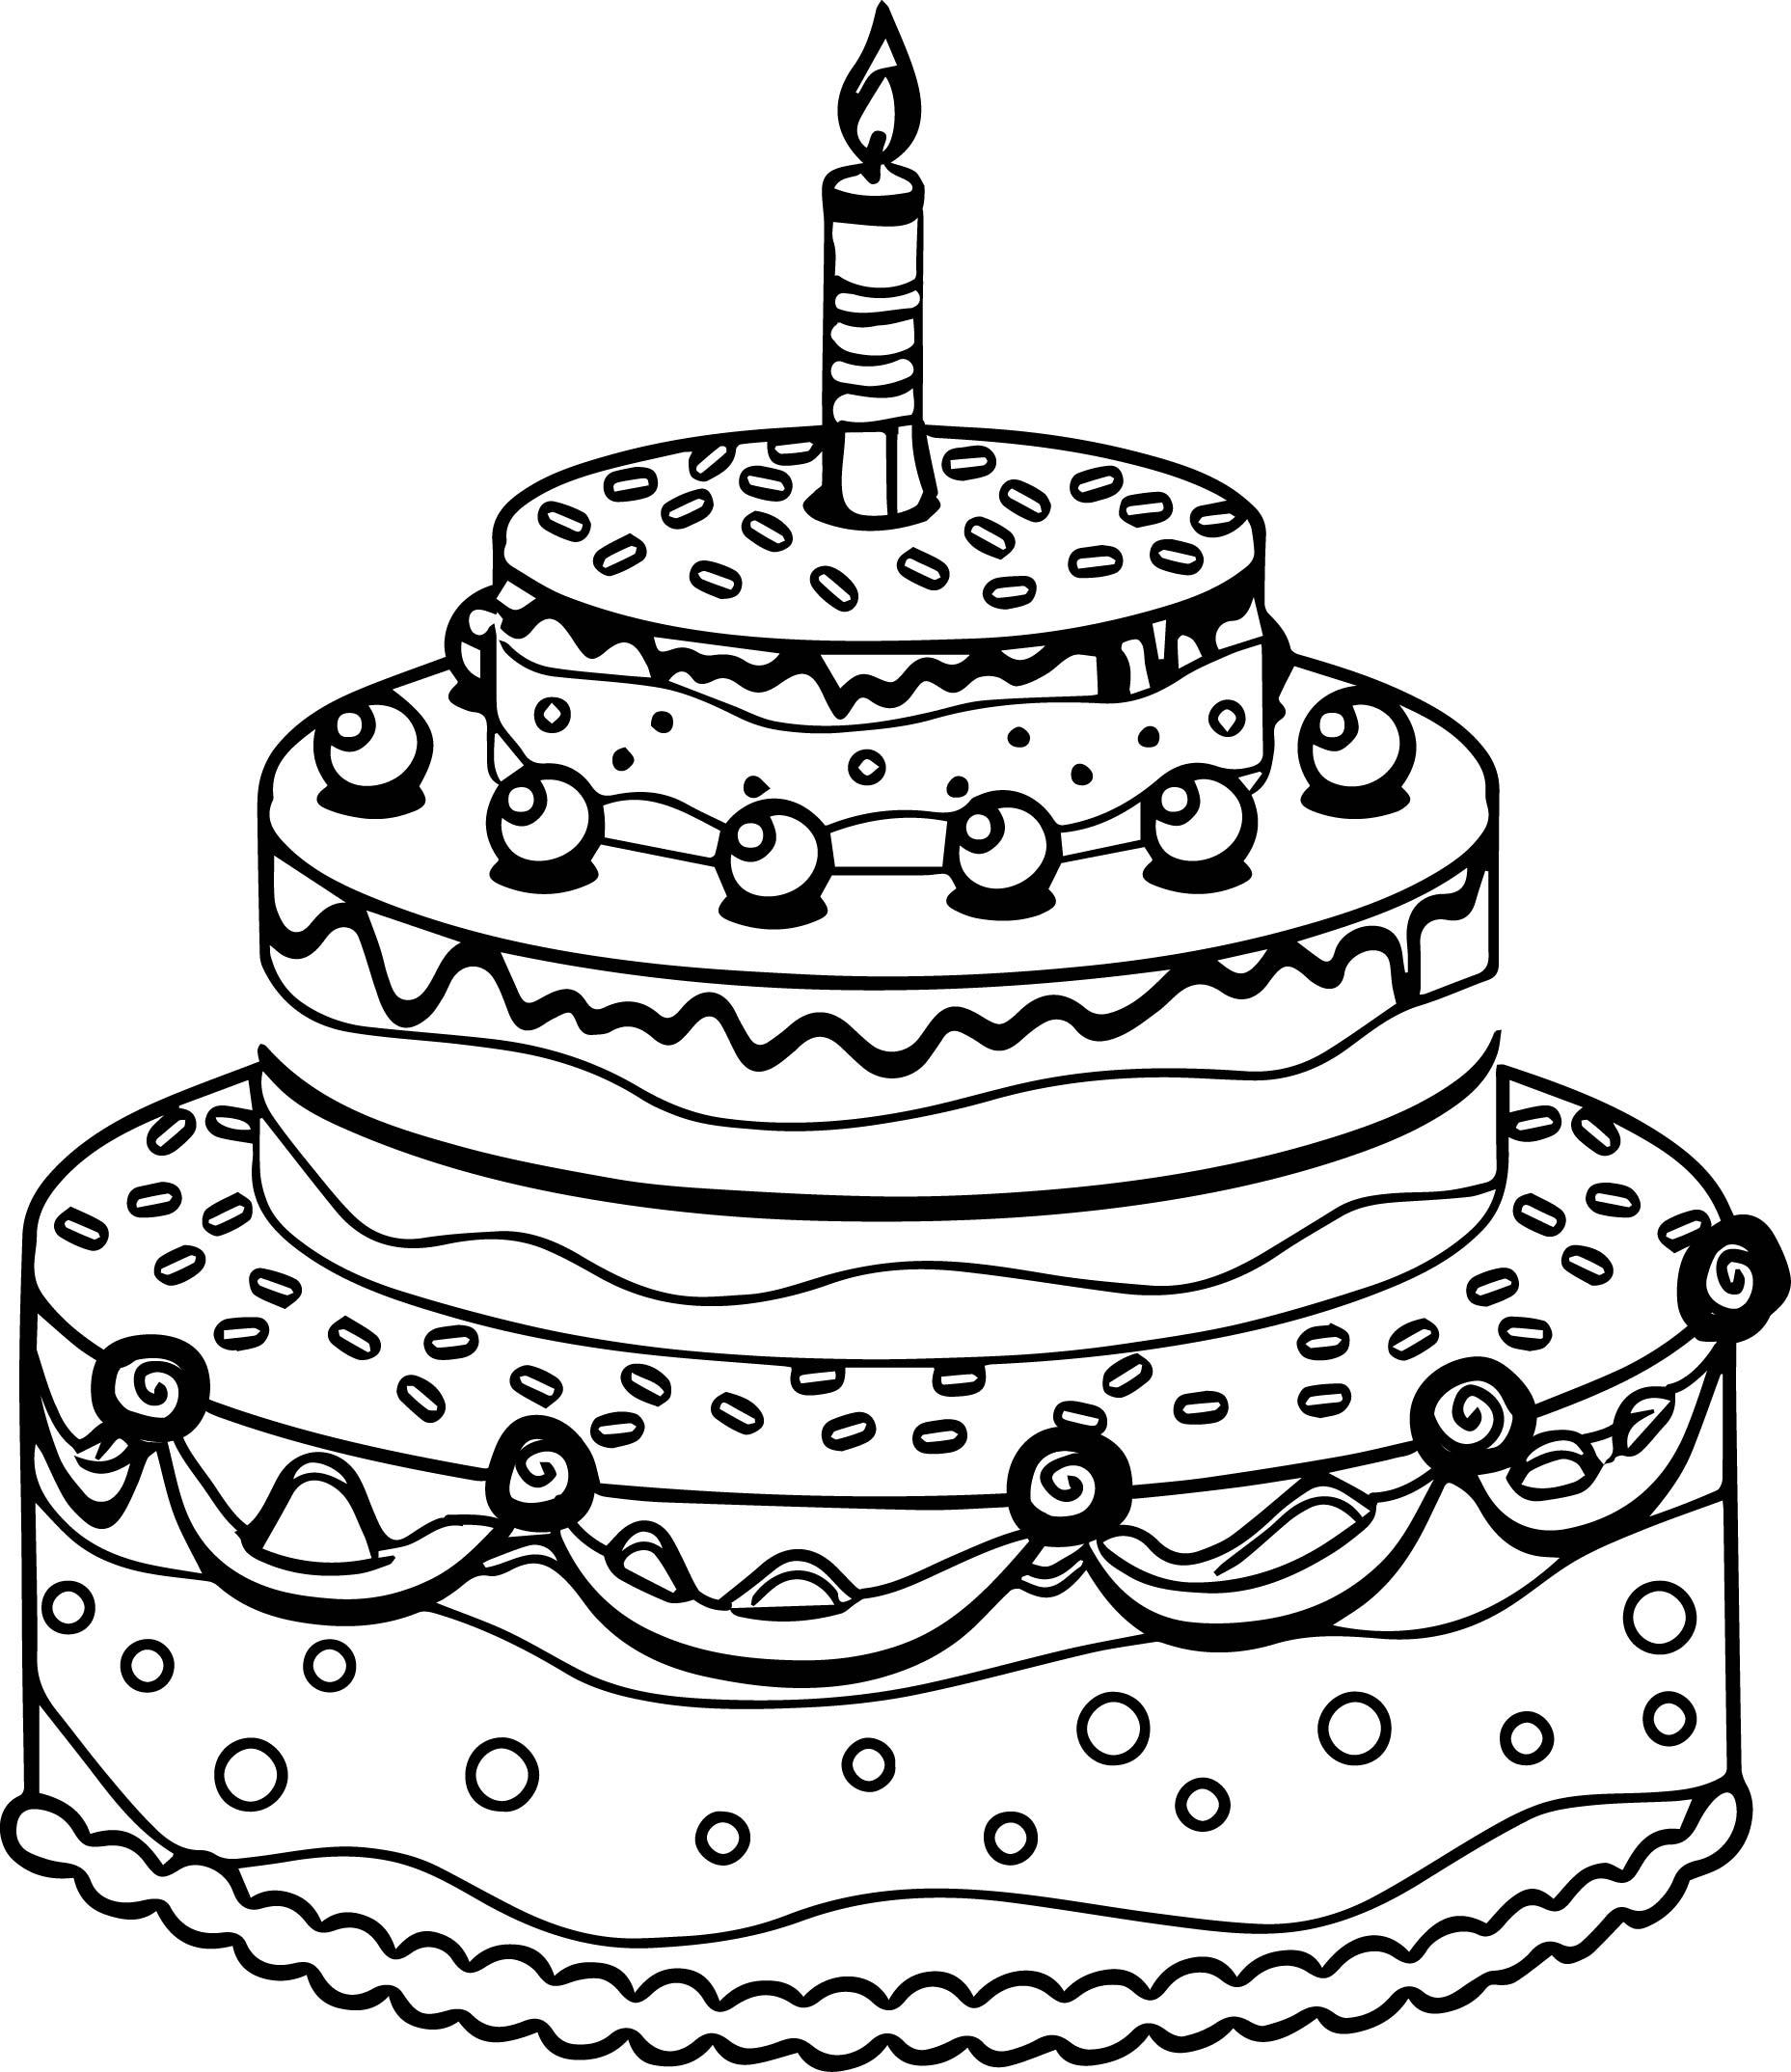 Birthday Cake Pencil Drawing At Getdrawings